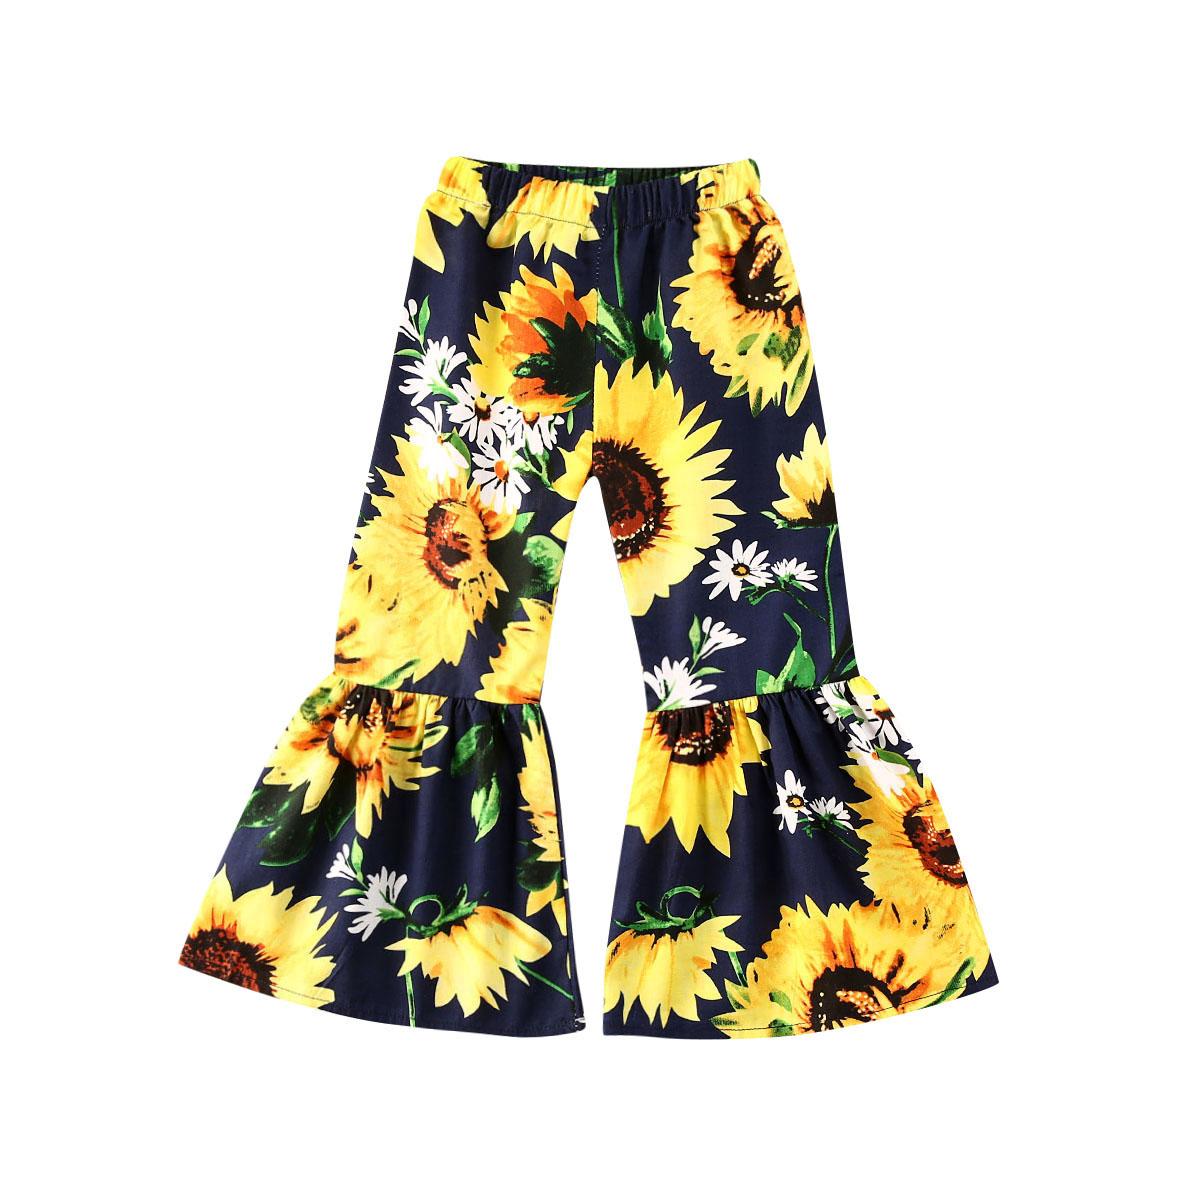 Pantalones Acampanados Para Ninas De 1 A 6 Anos Pantalones Holgados Con Volantes Estampado De Girasoles Ropa De Verano Para Ninos Pantalones Aliexpress